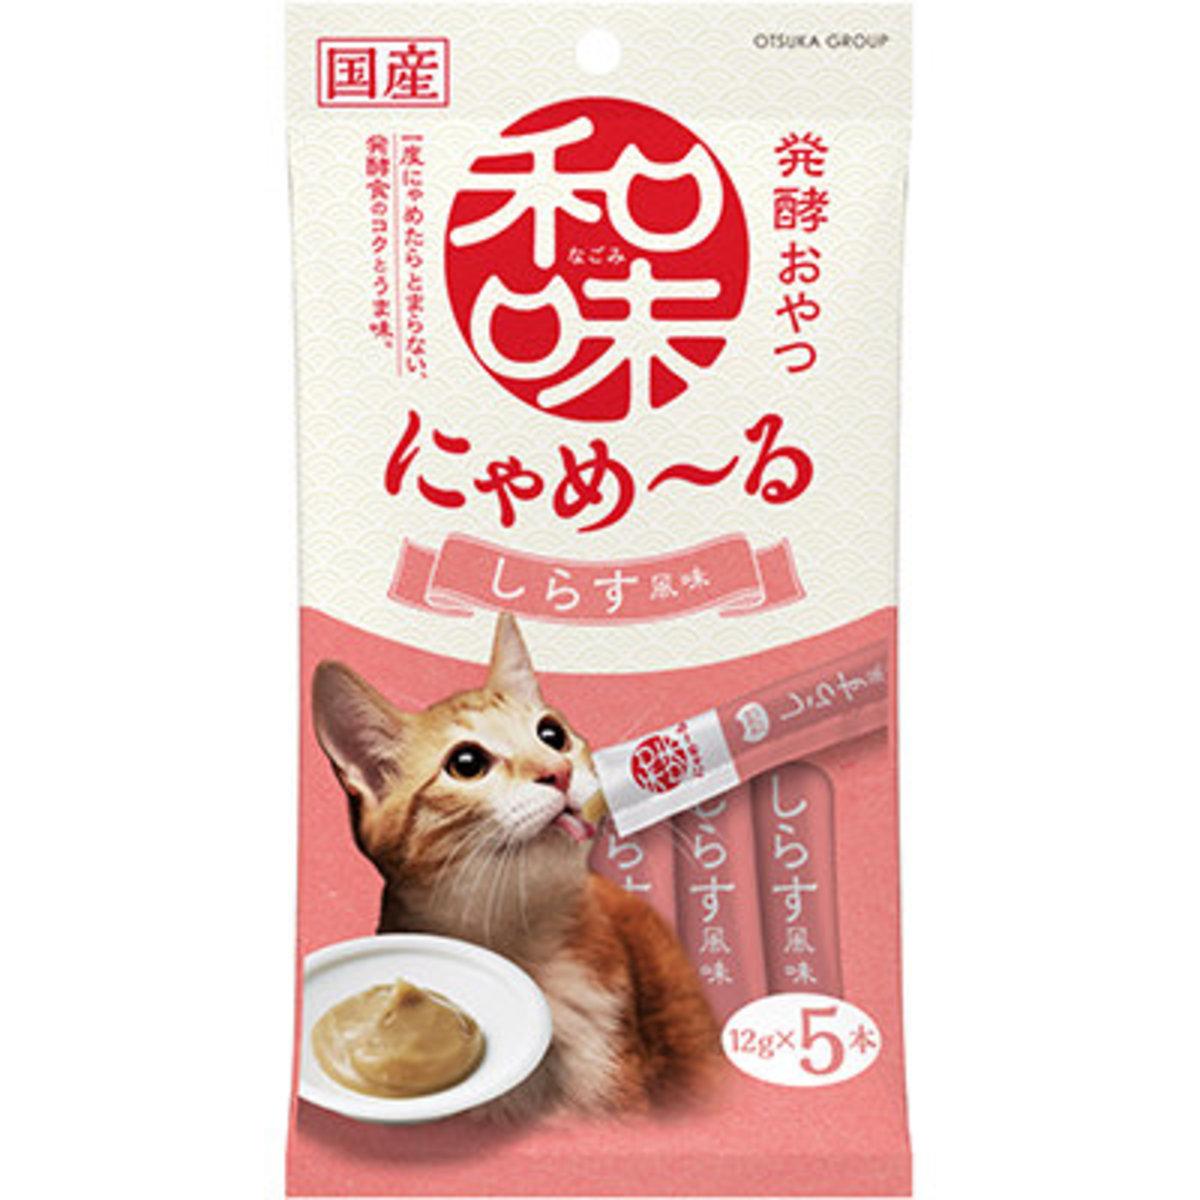 Nyameru Shirasu Flavor Cat Snacks (12g x 5)  #880008_pink